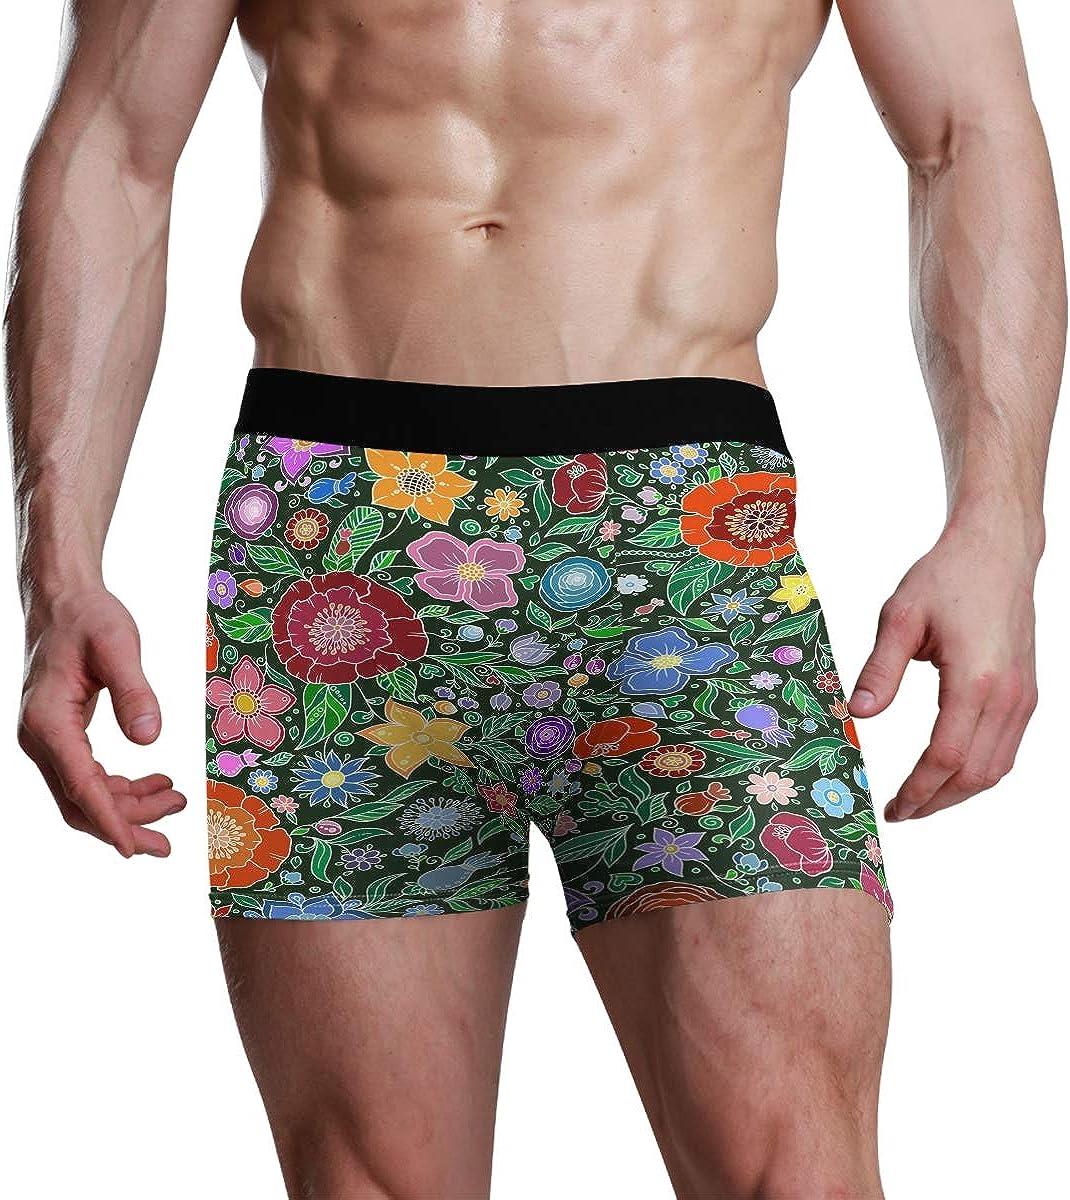 HangWang Mens Boxer Briefs Underwear Seamless Vector Pattern with Leaves and Flowers Trunks Underwear Short Leg Boys